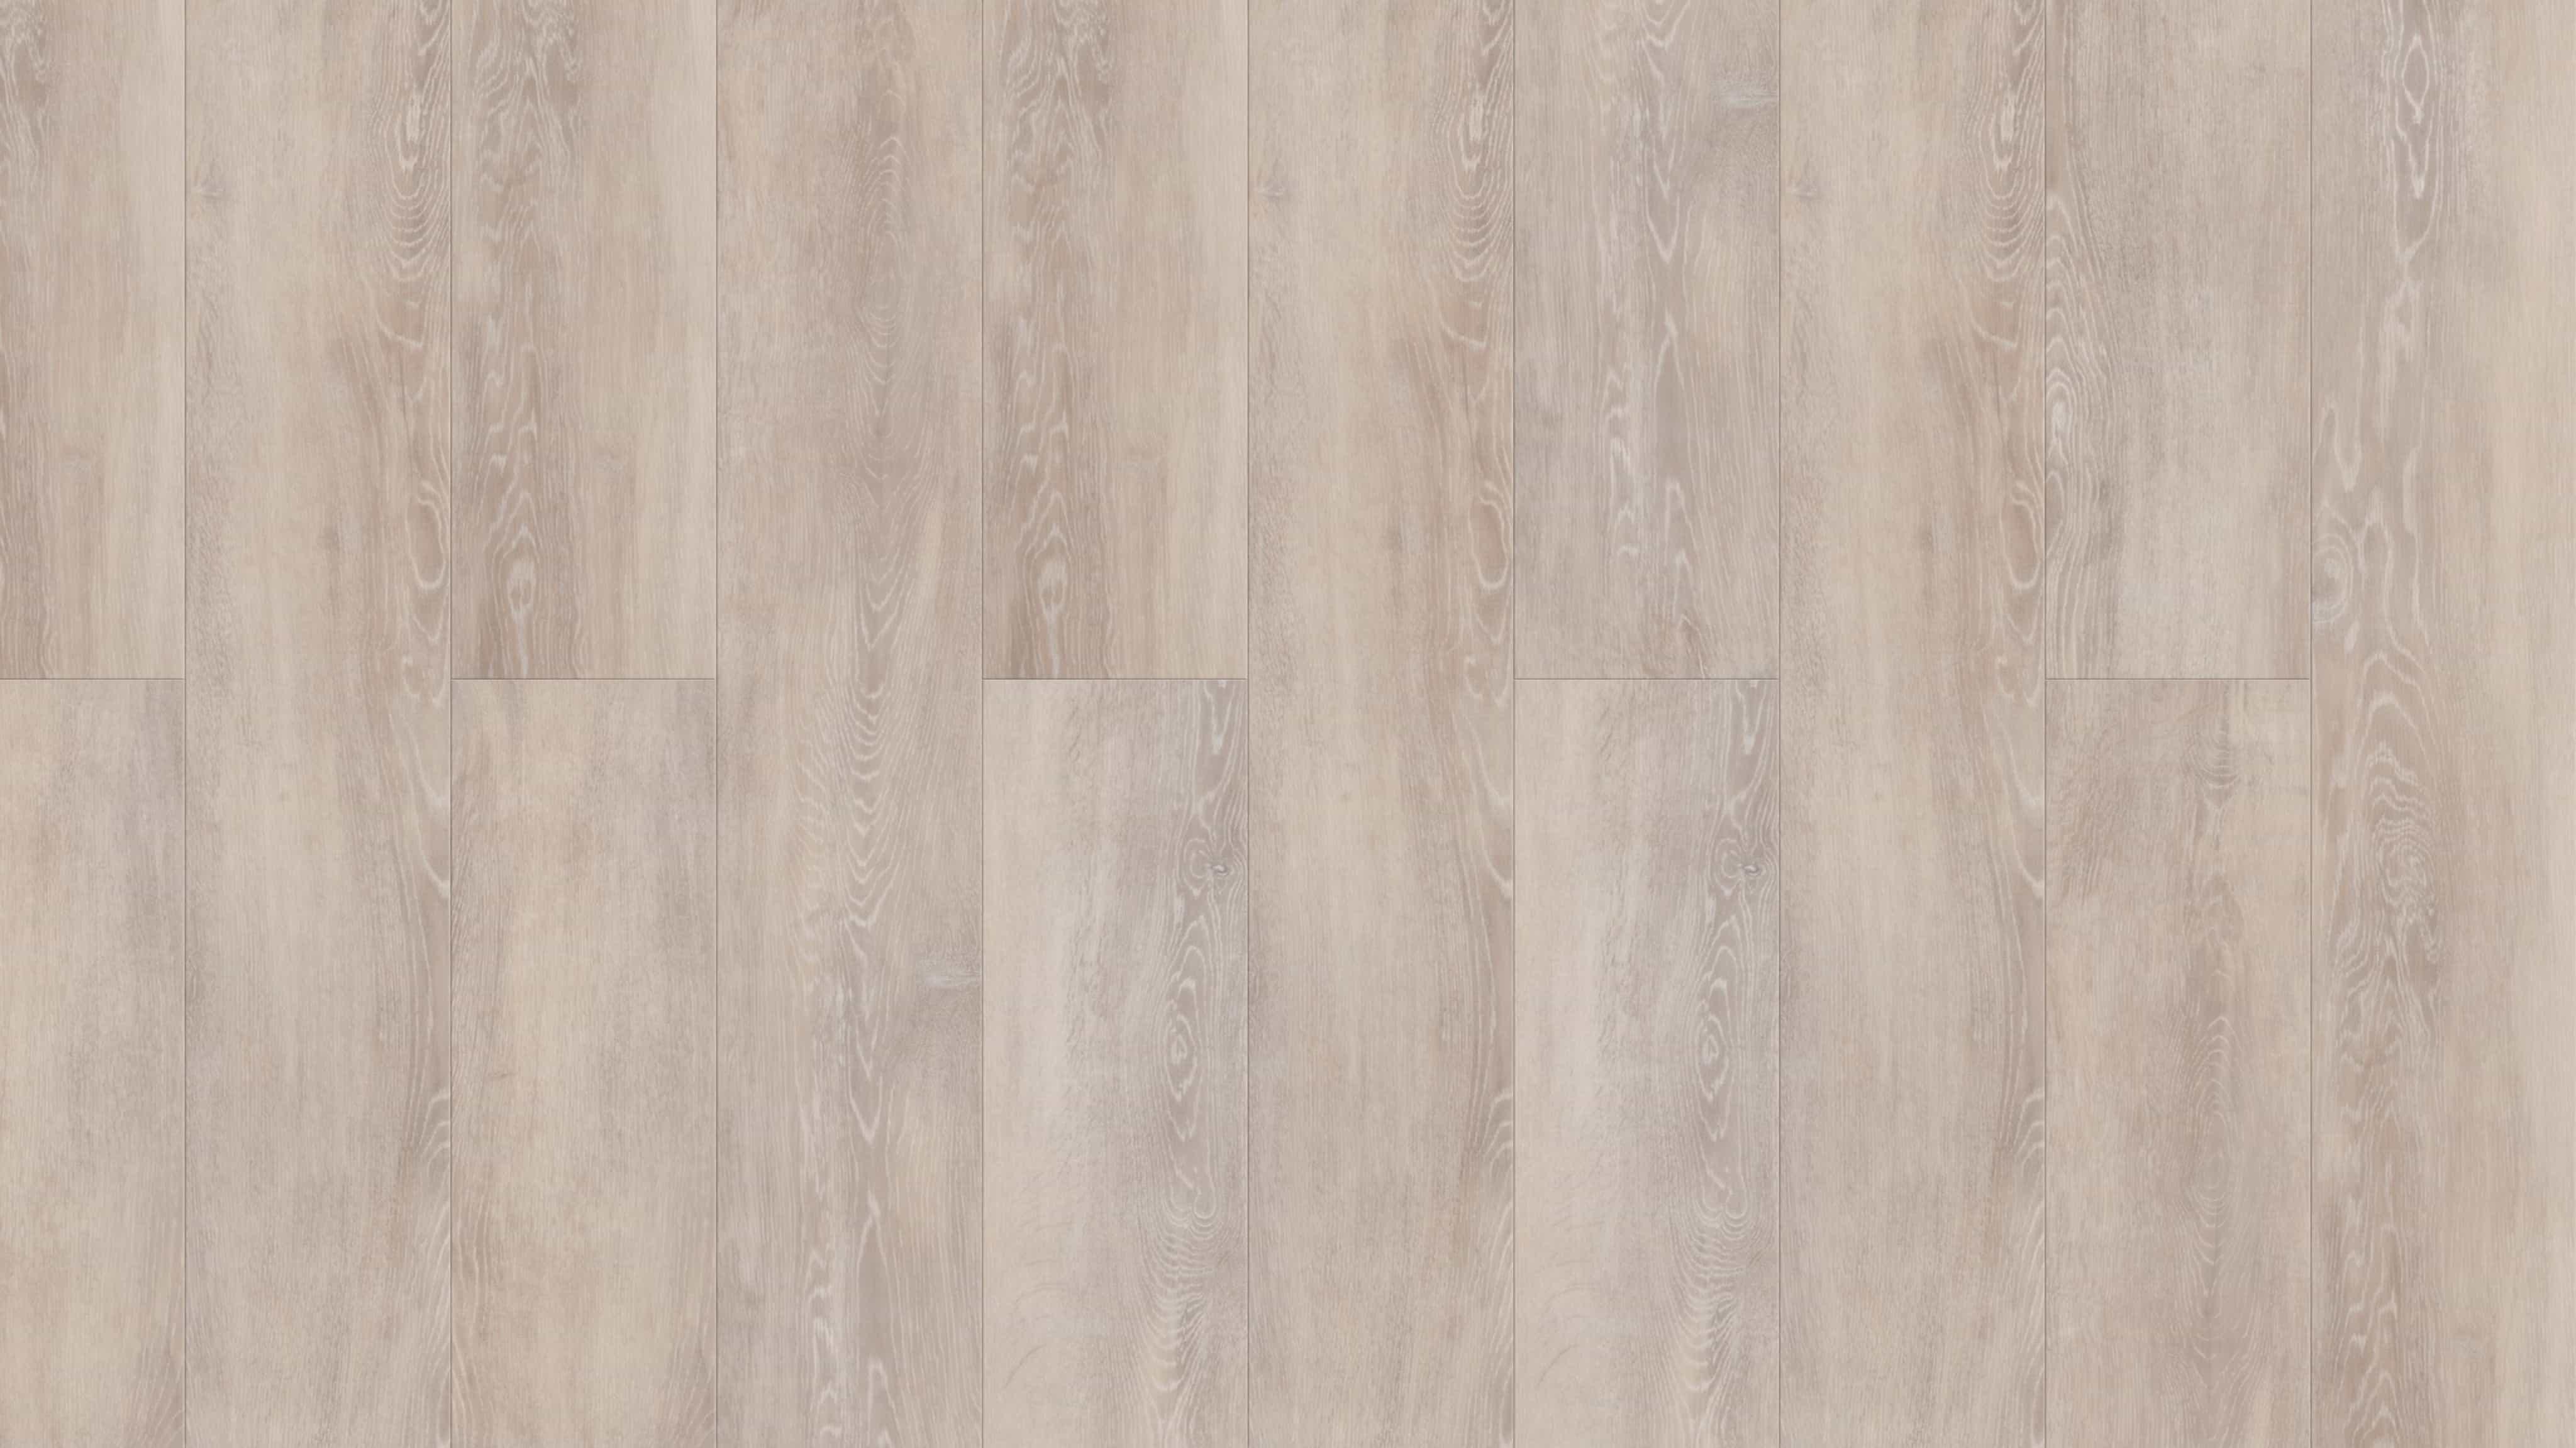 Chalked Lace White Oak LVT